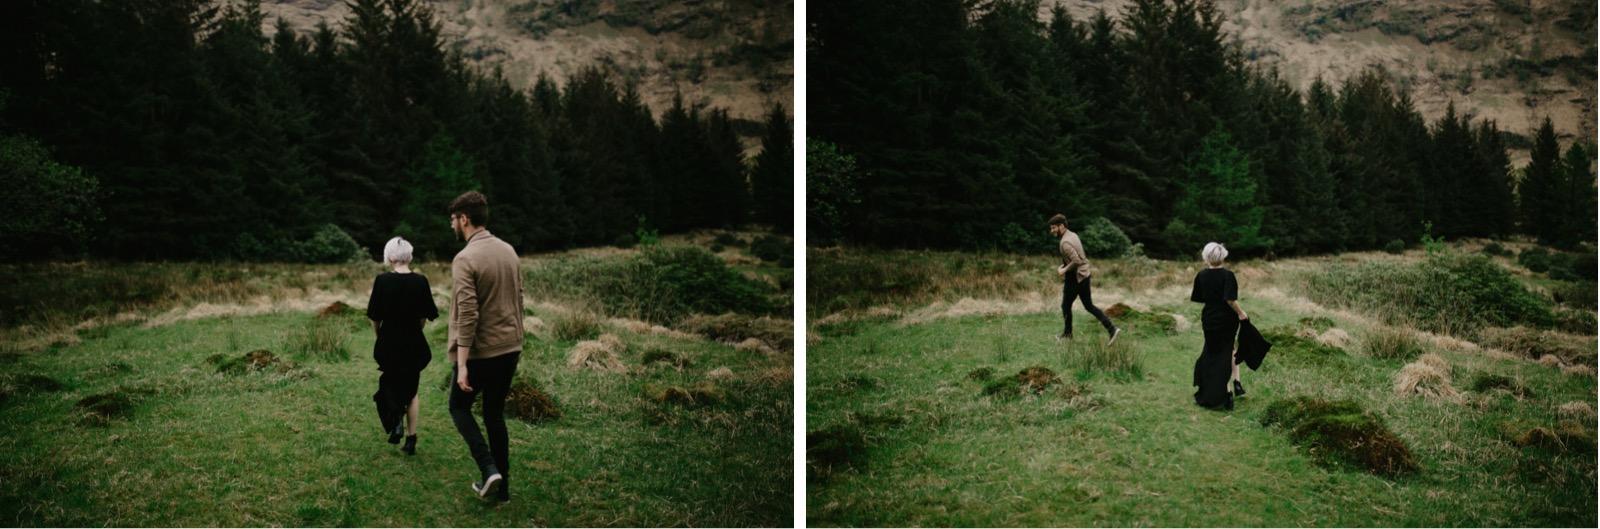 31_TamarHopePhotography-116_TamarHopePhotography-118.jpg